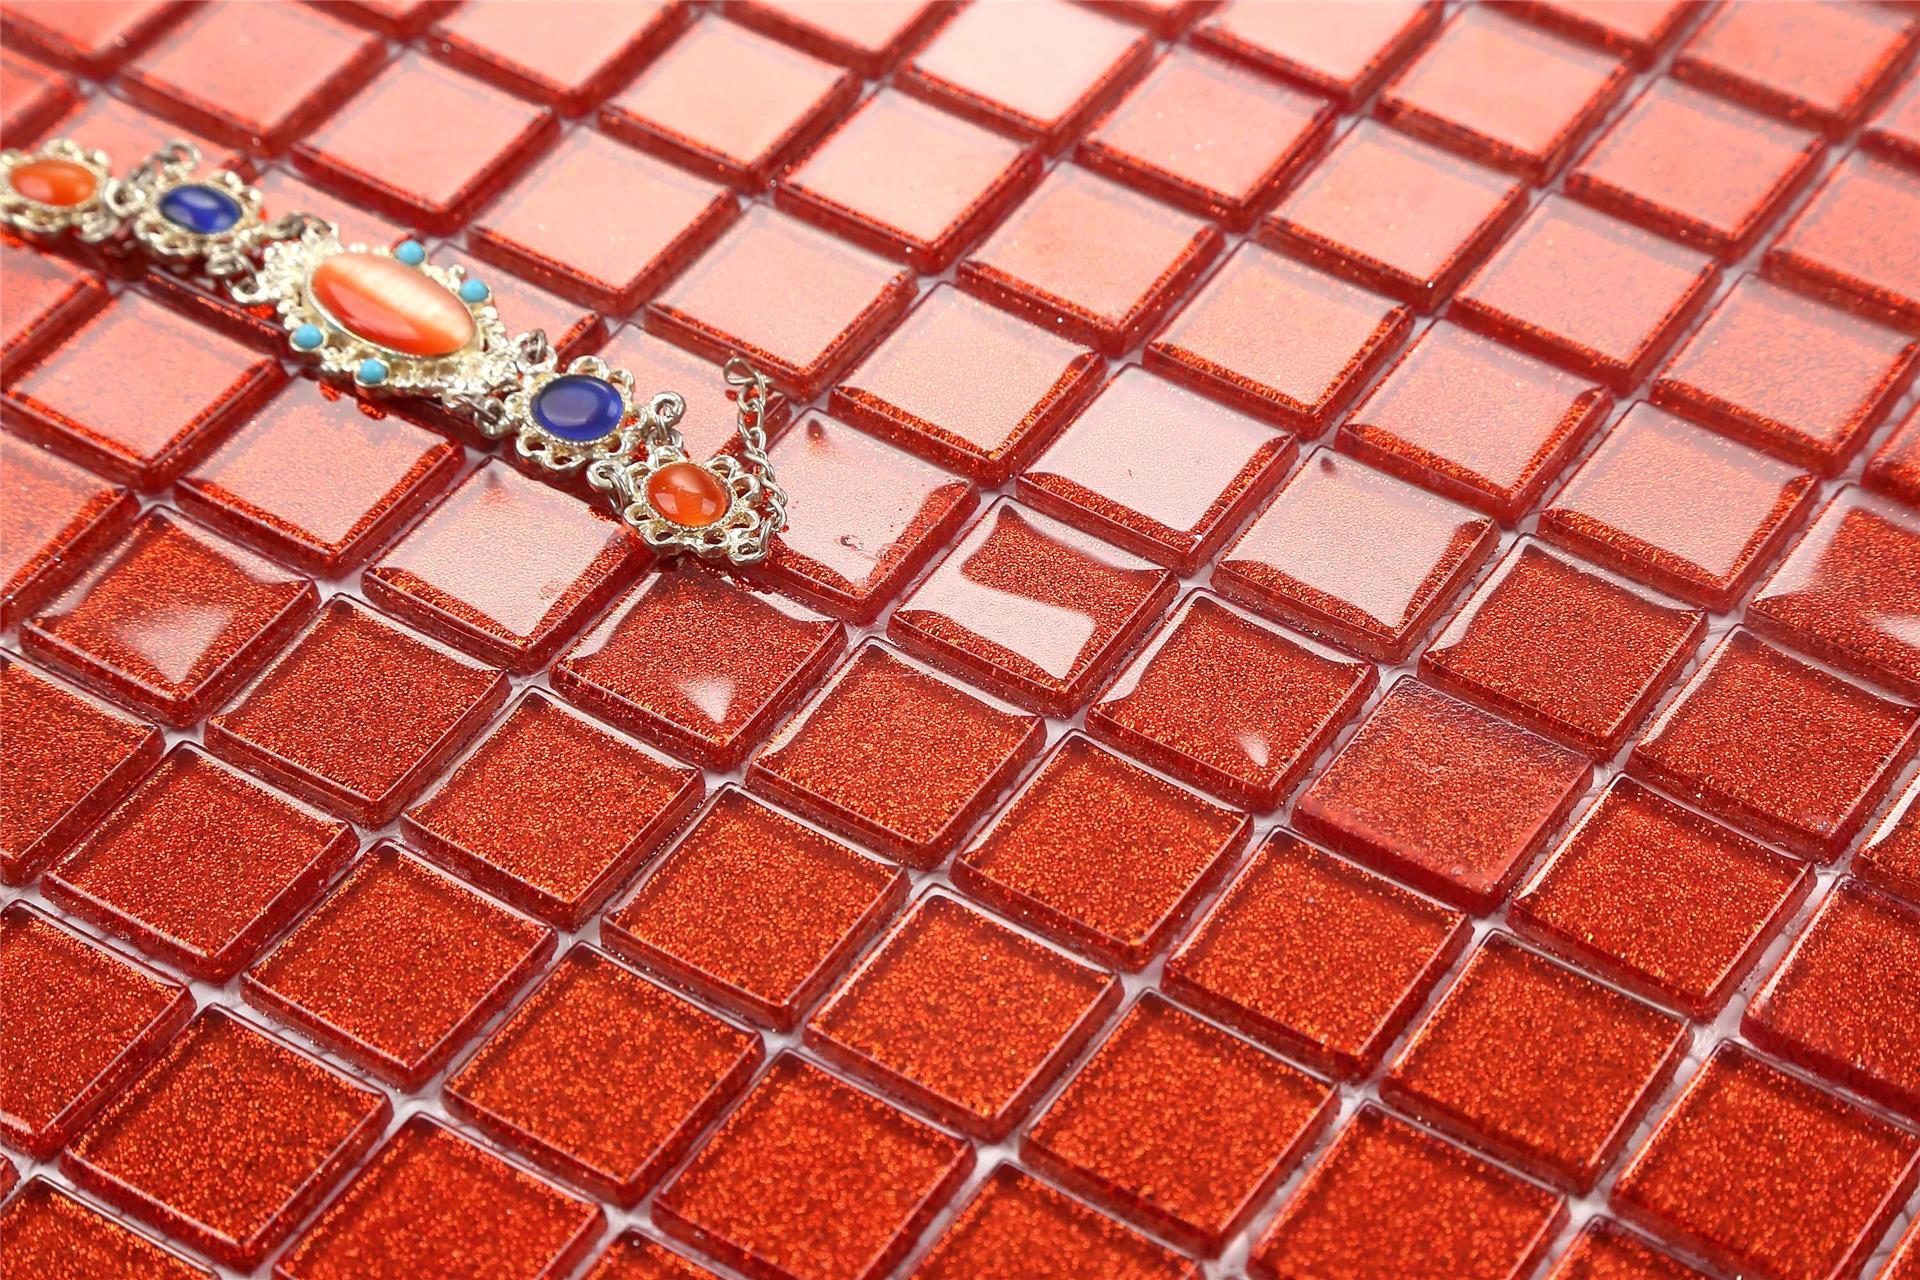 Mosaic tiles glass glitter red bathroom kitchen walls